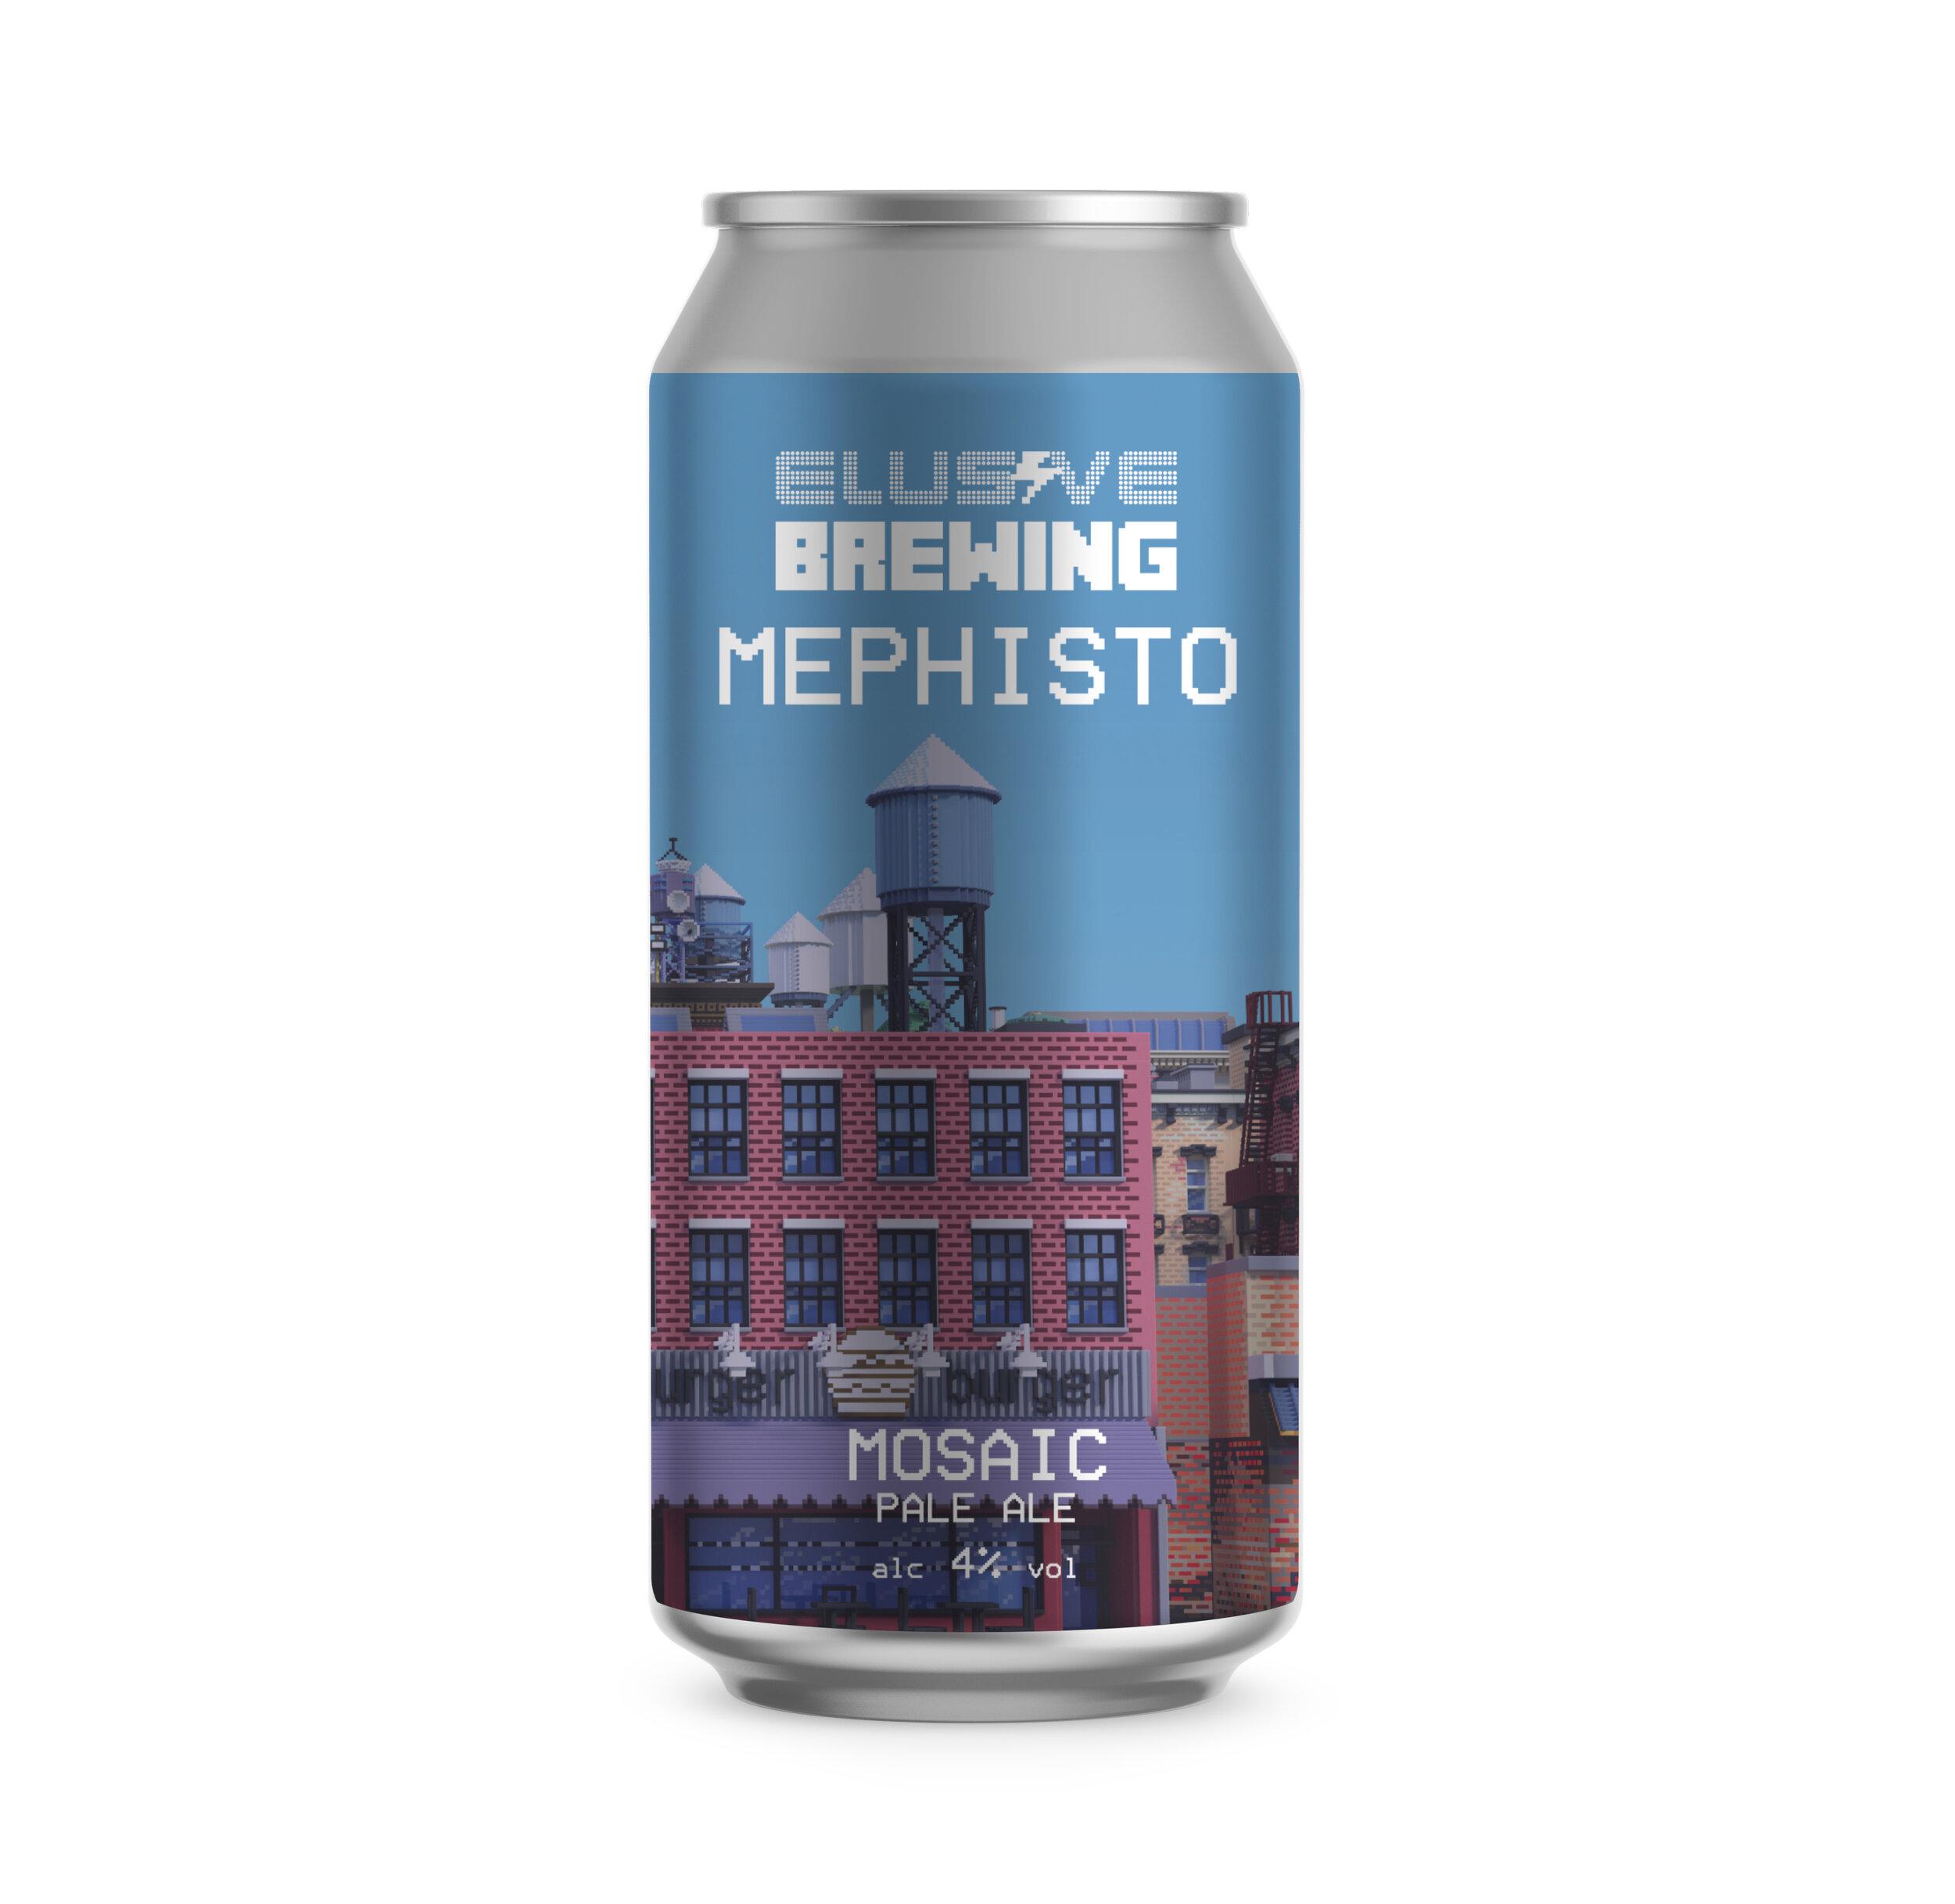 Elusive - Mephisto